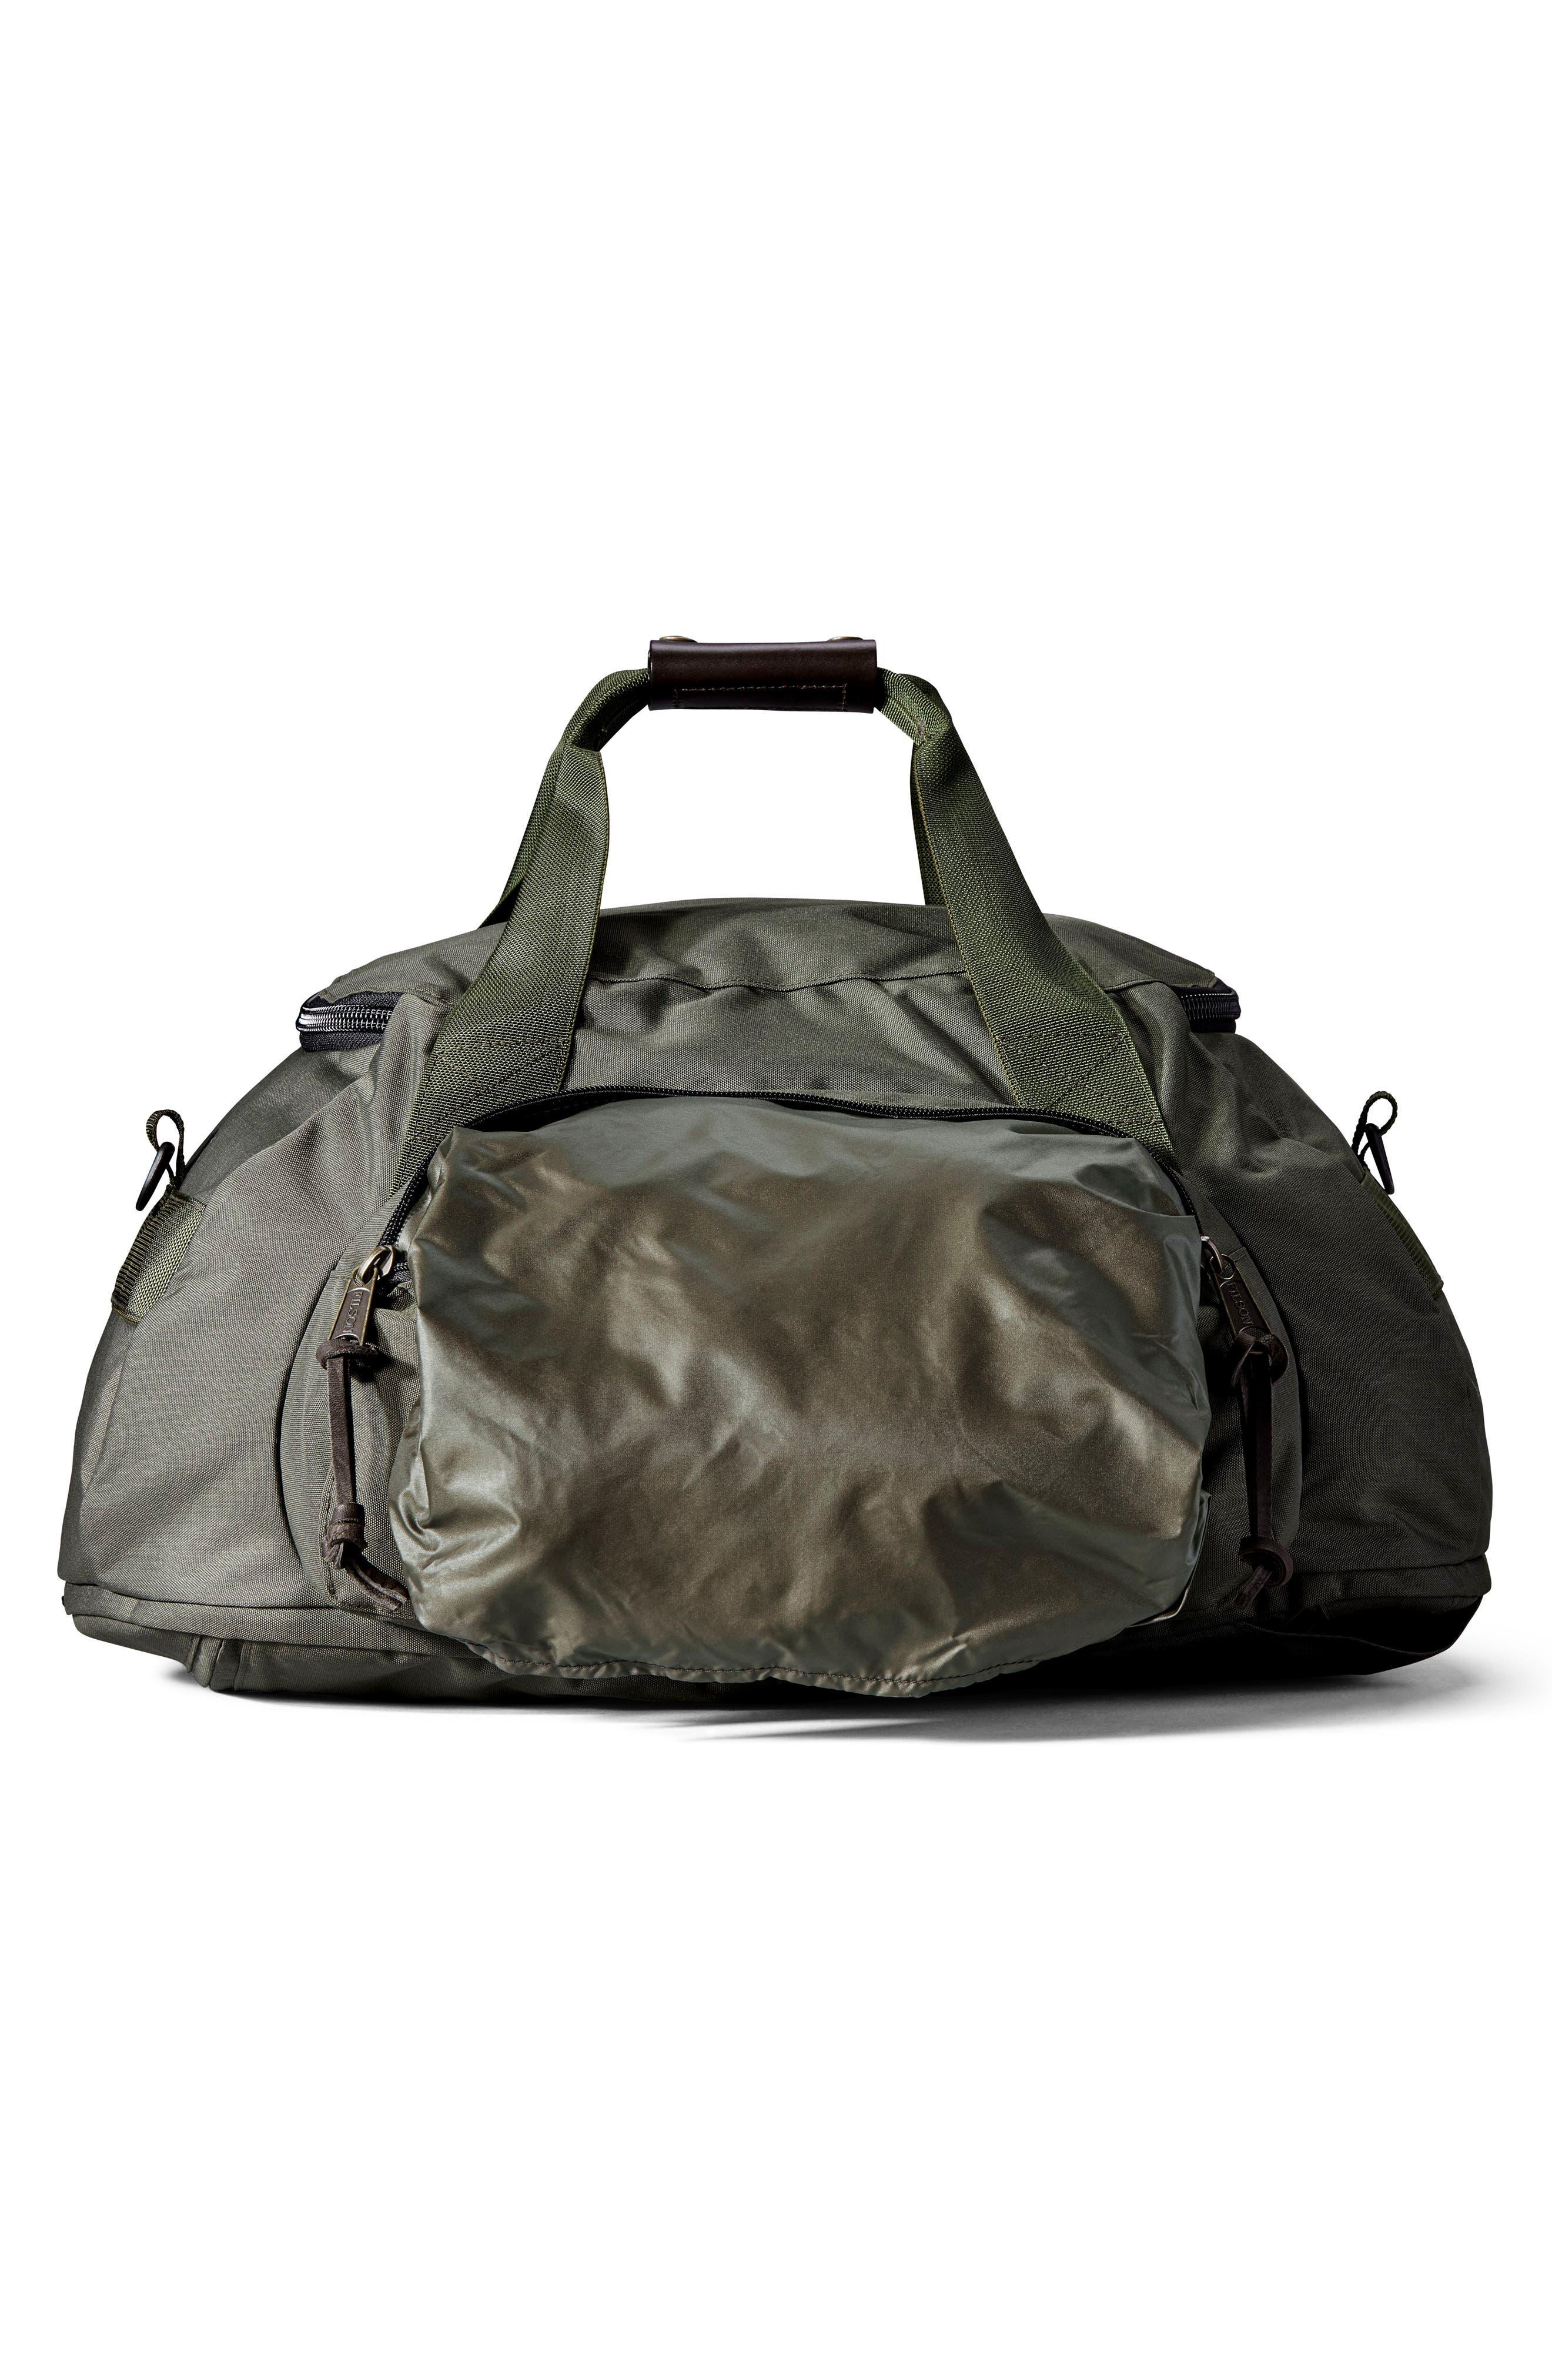 Convertible Duffel Bag,                             Alternate thumbnail 4, color,                             Otter Green